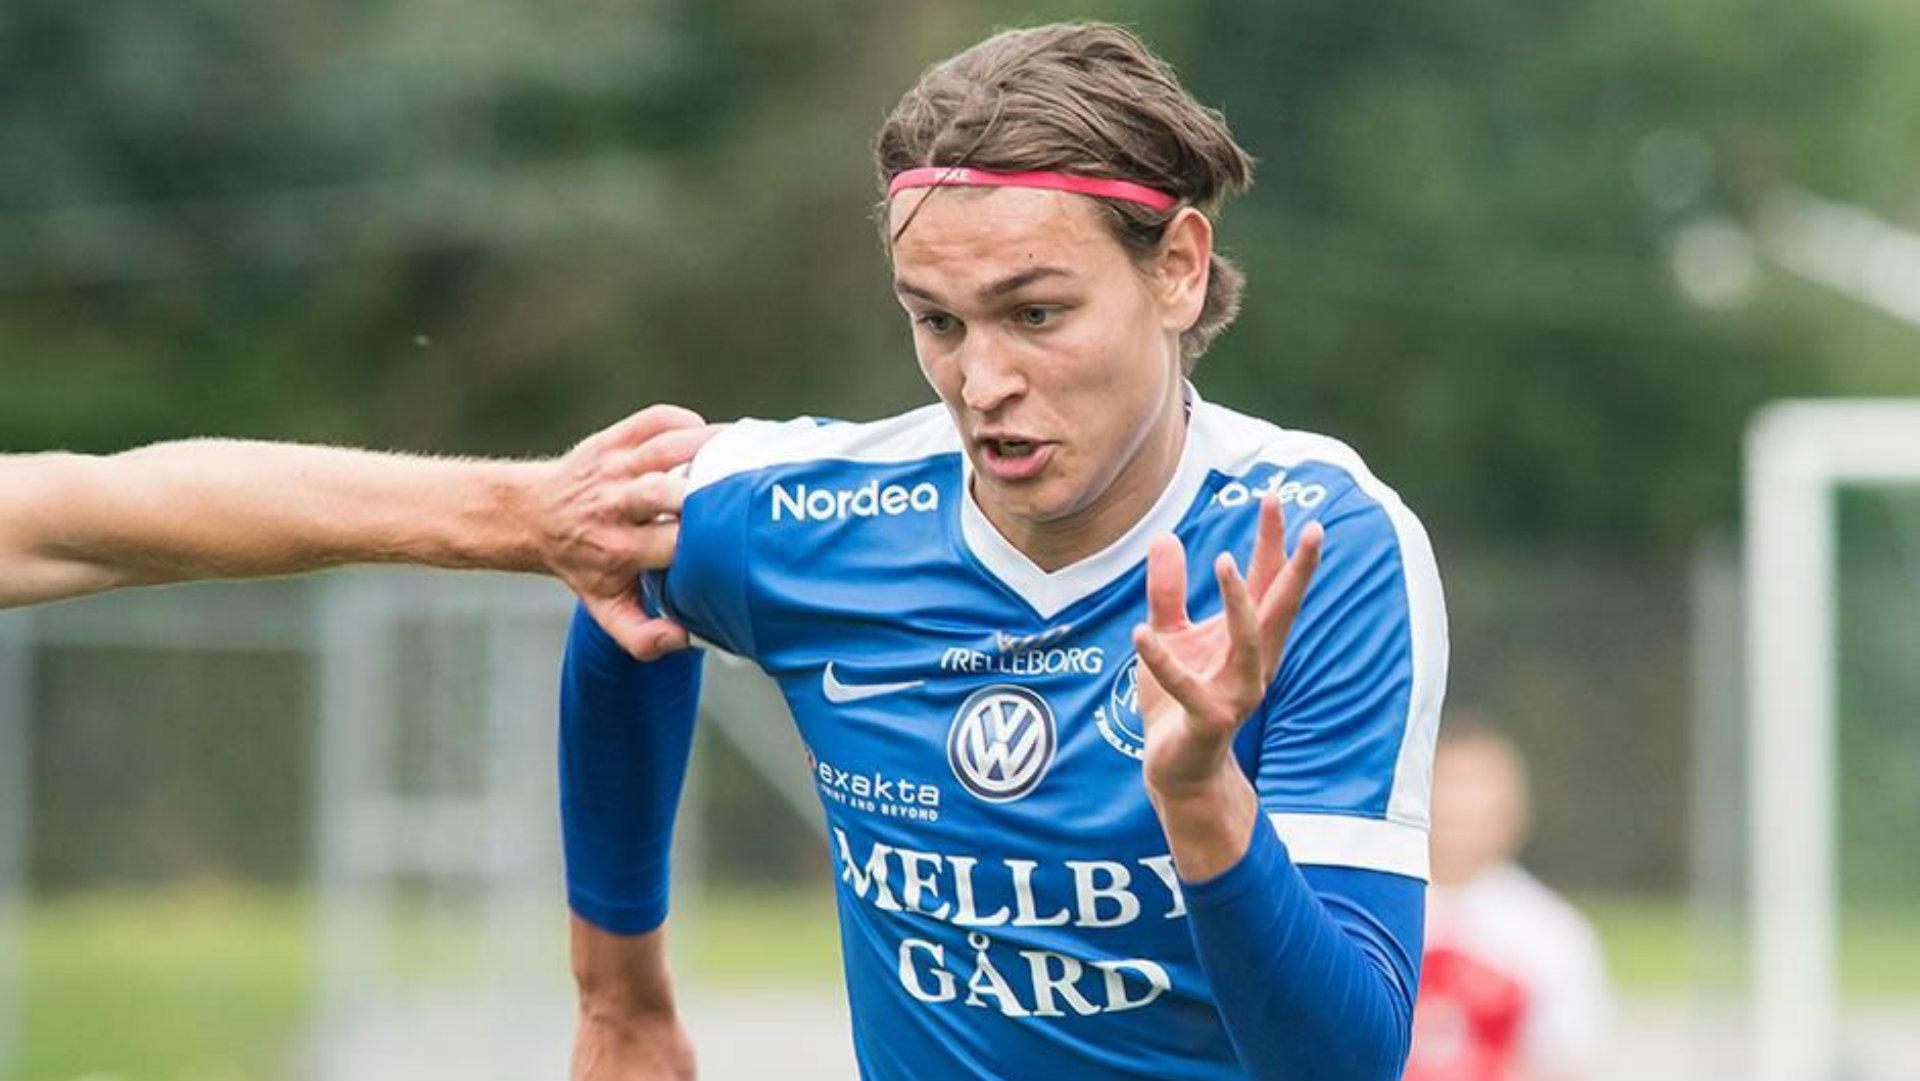 Noah Christoffersson Trelleborgs 280918